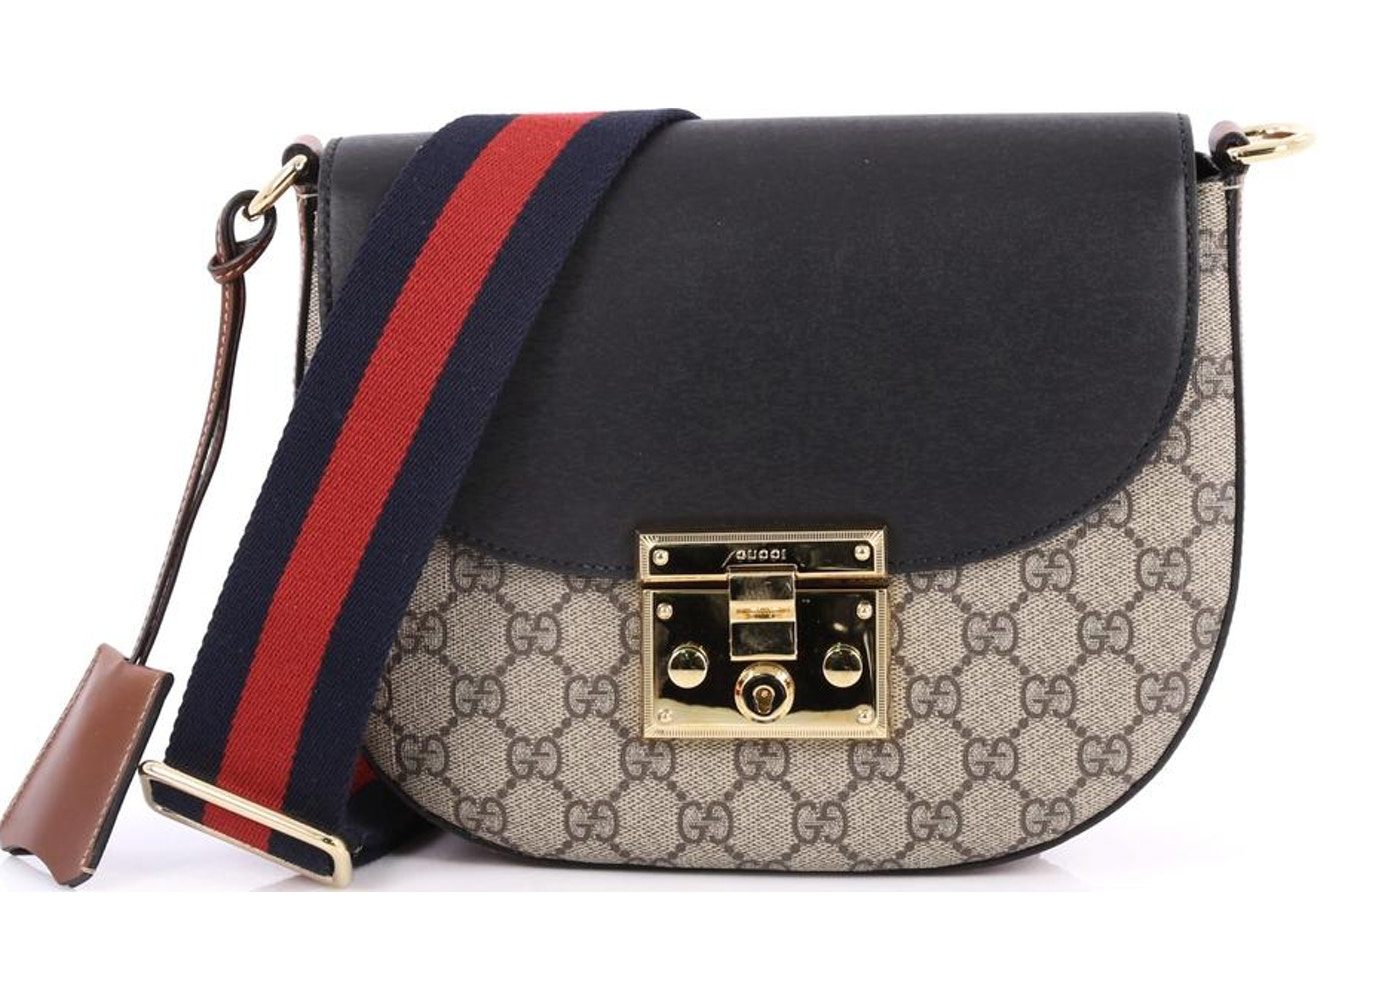 a1ee80df Gucci Padlock Shoulder Bag Monogram GG Medium Tan/Black/Brown ...